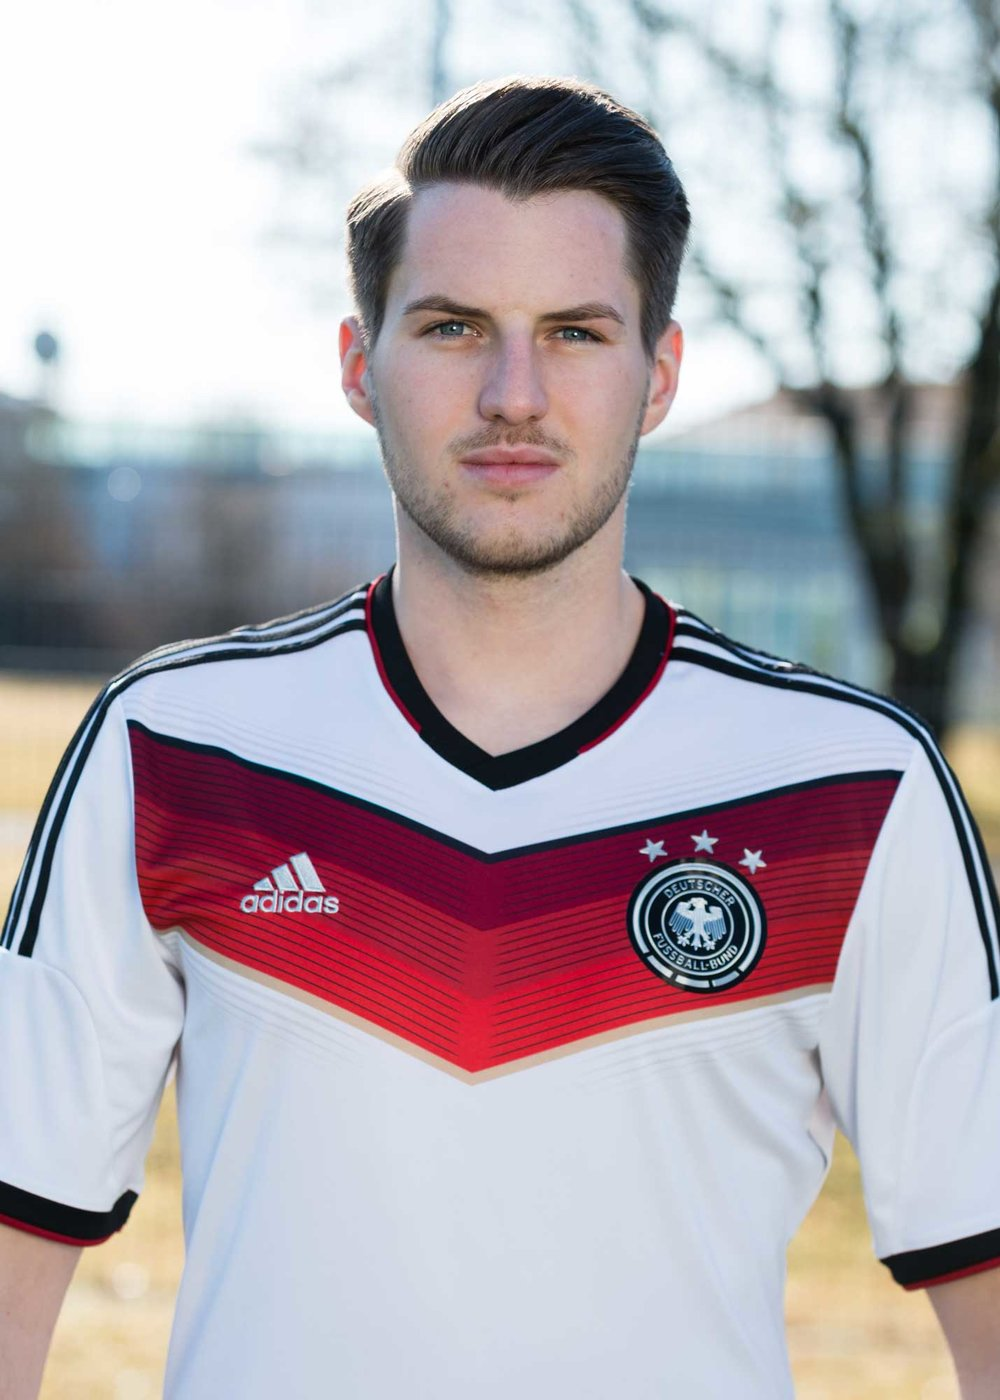 Michael F. - 189cm  Landesliga München